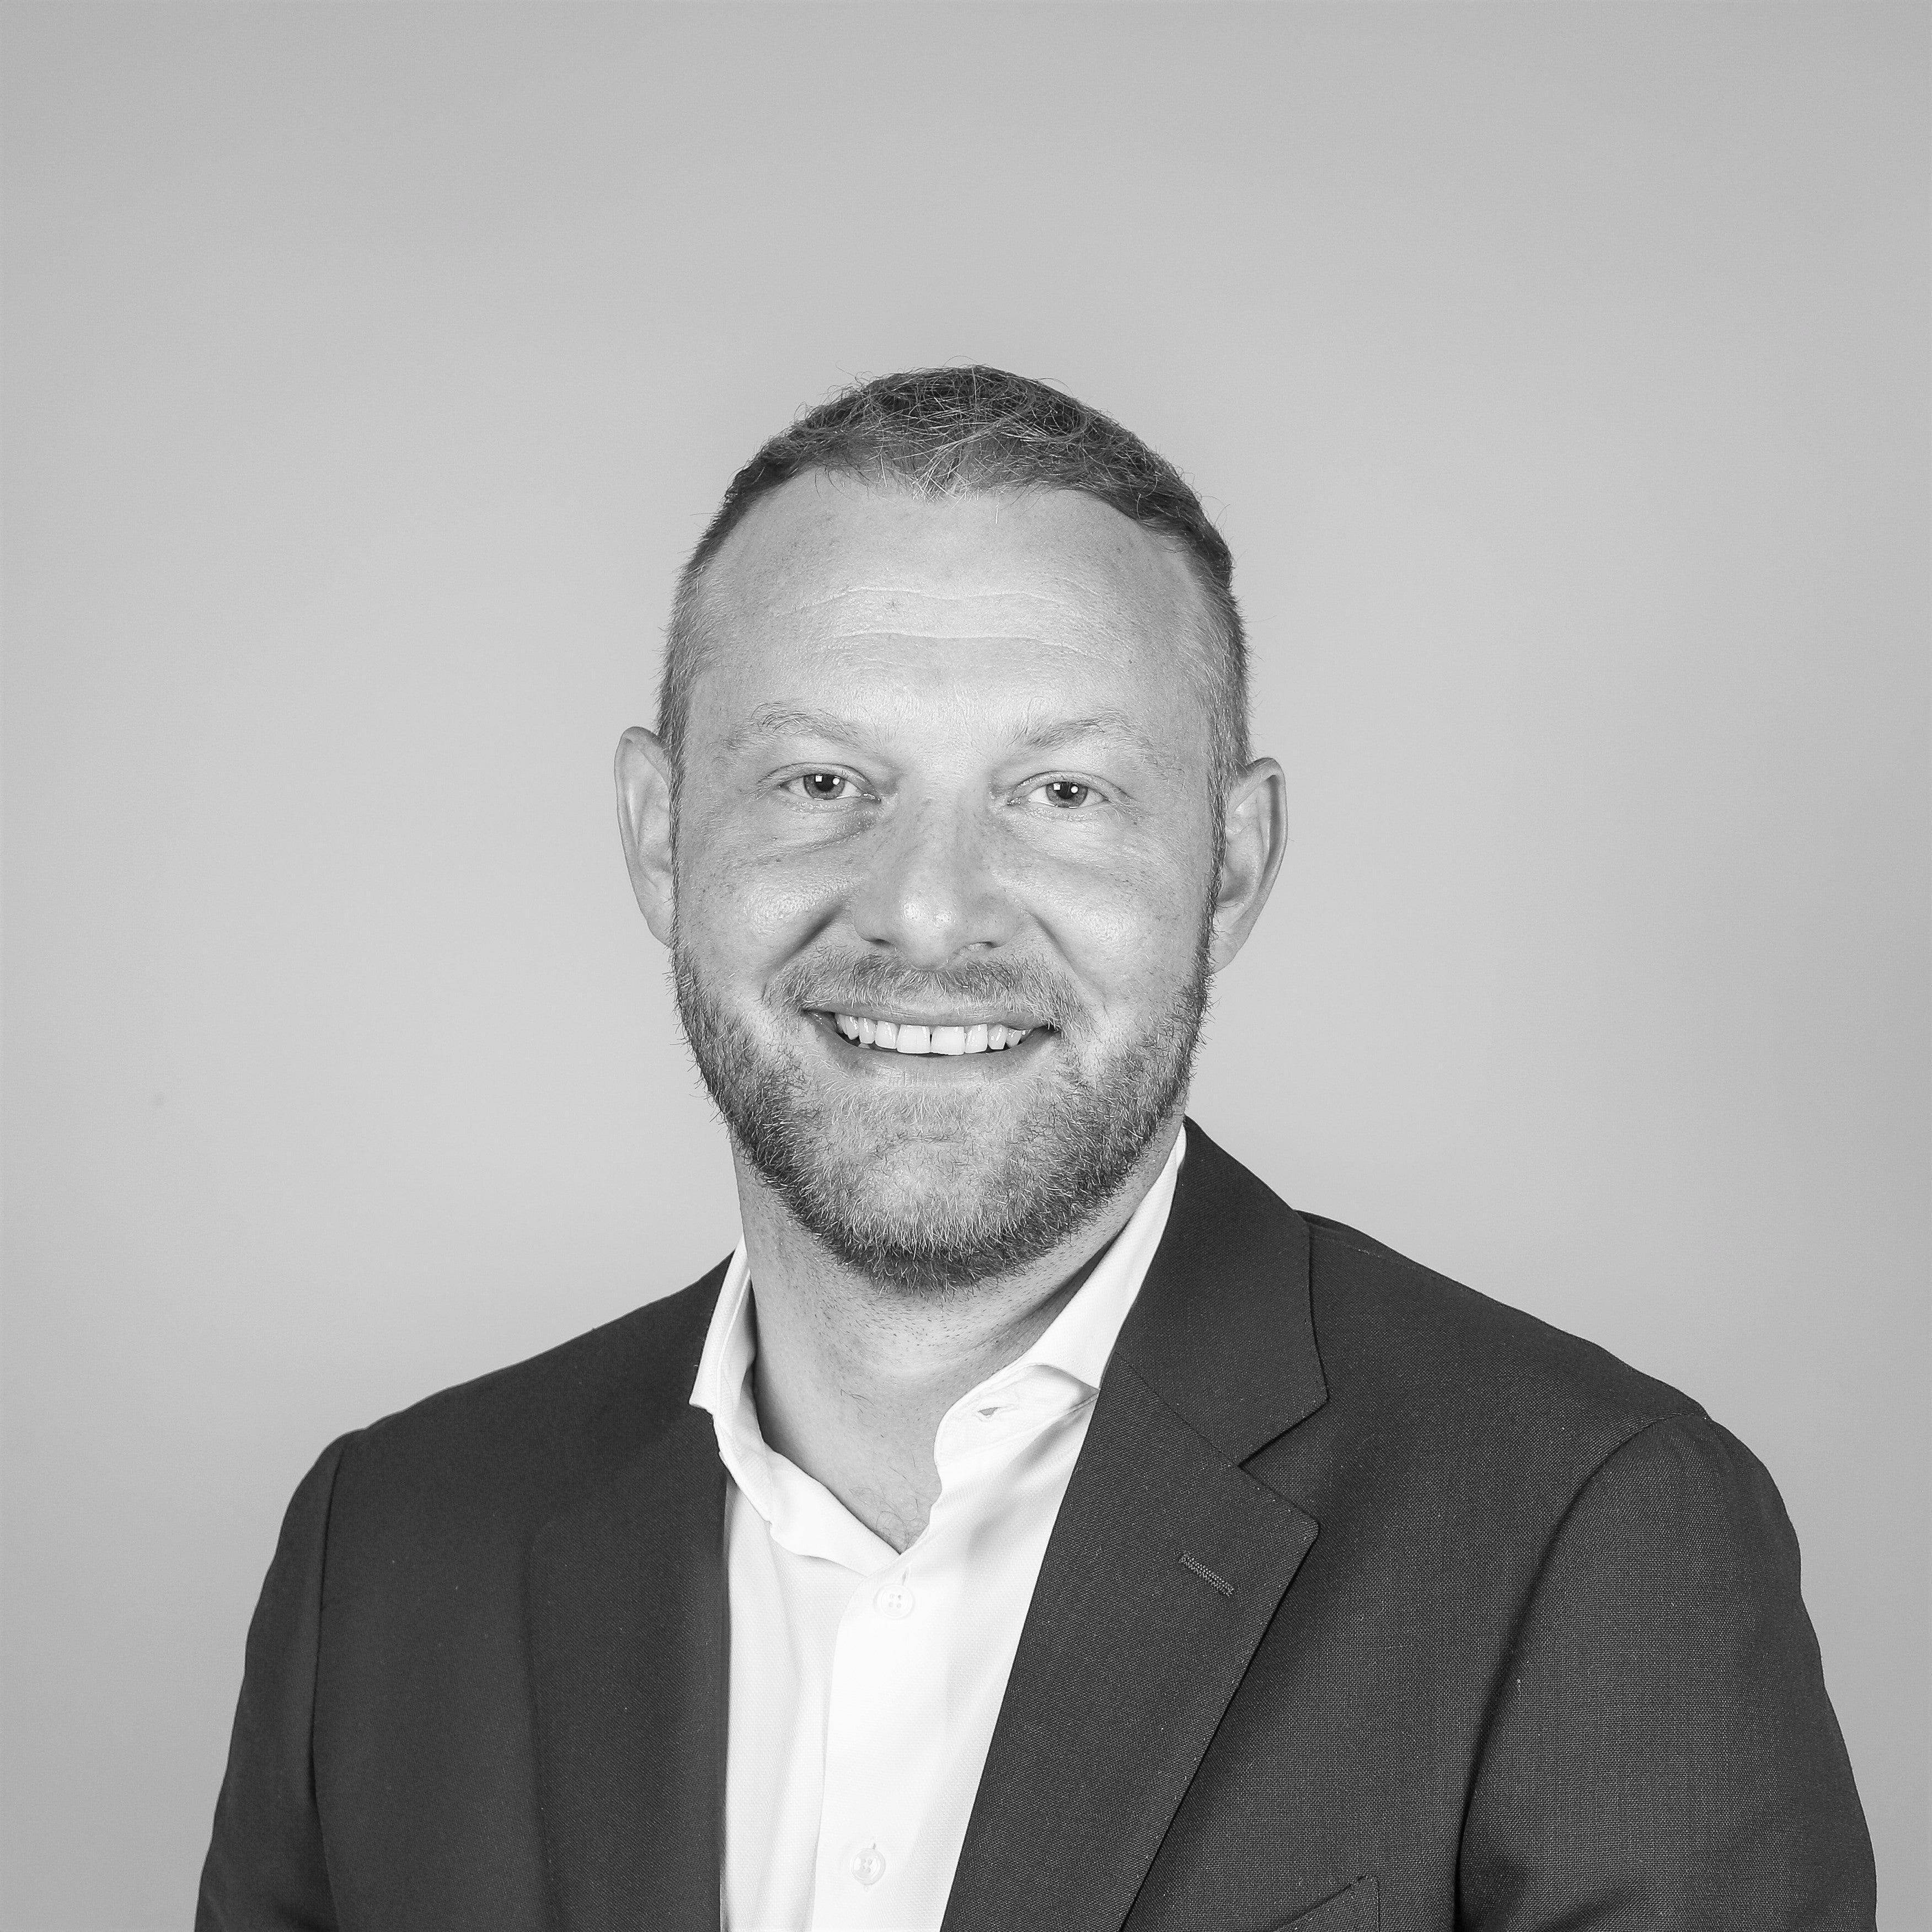 Jonas Eliassen, Managing Director, Carat Switzerland